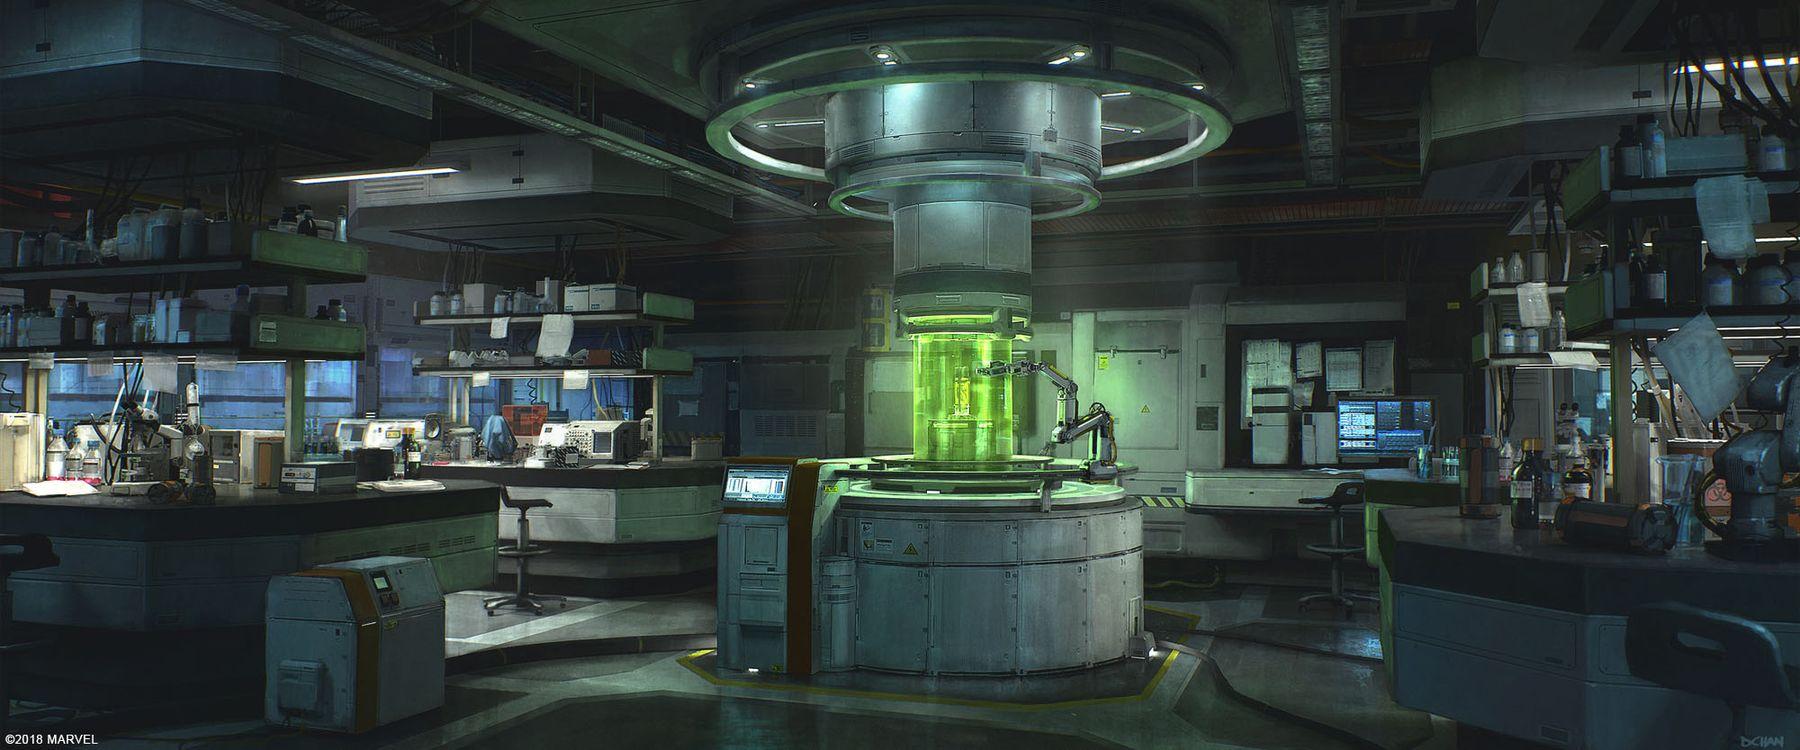 http://conceptartworld.com/wp-content/uploads/2019/01/Spider-Man-PS4-Game-Concept-Art-Dennis-Chan-Lab_Interior_Concept_Final_v002.jpg